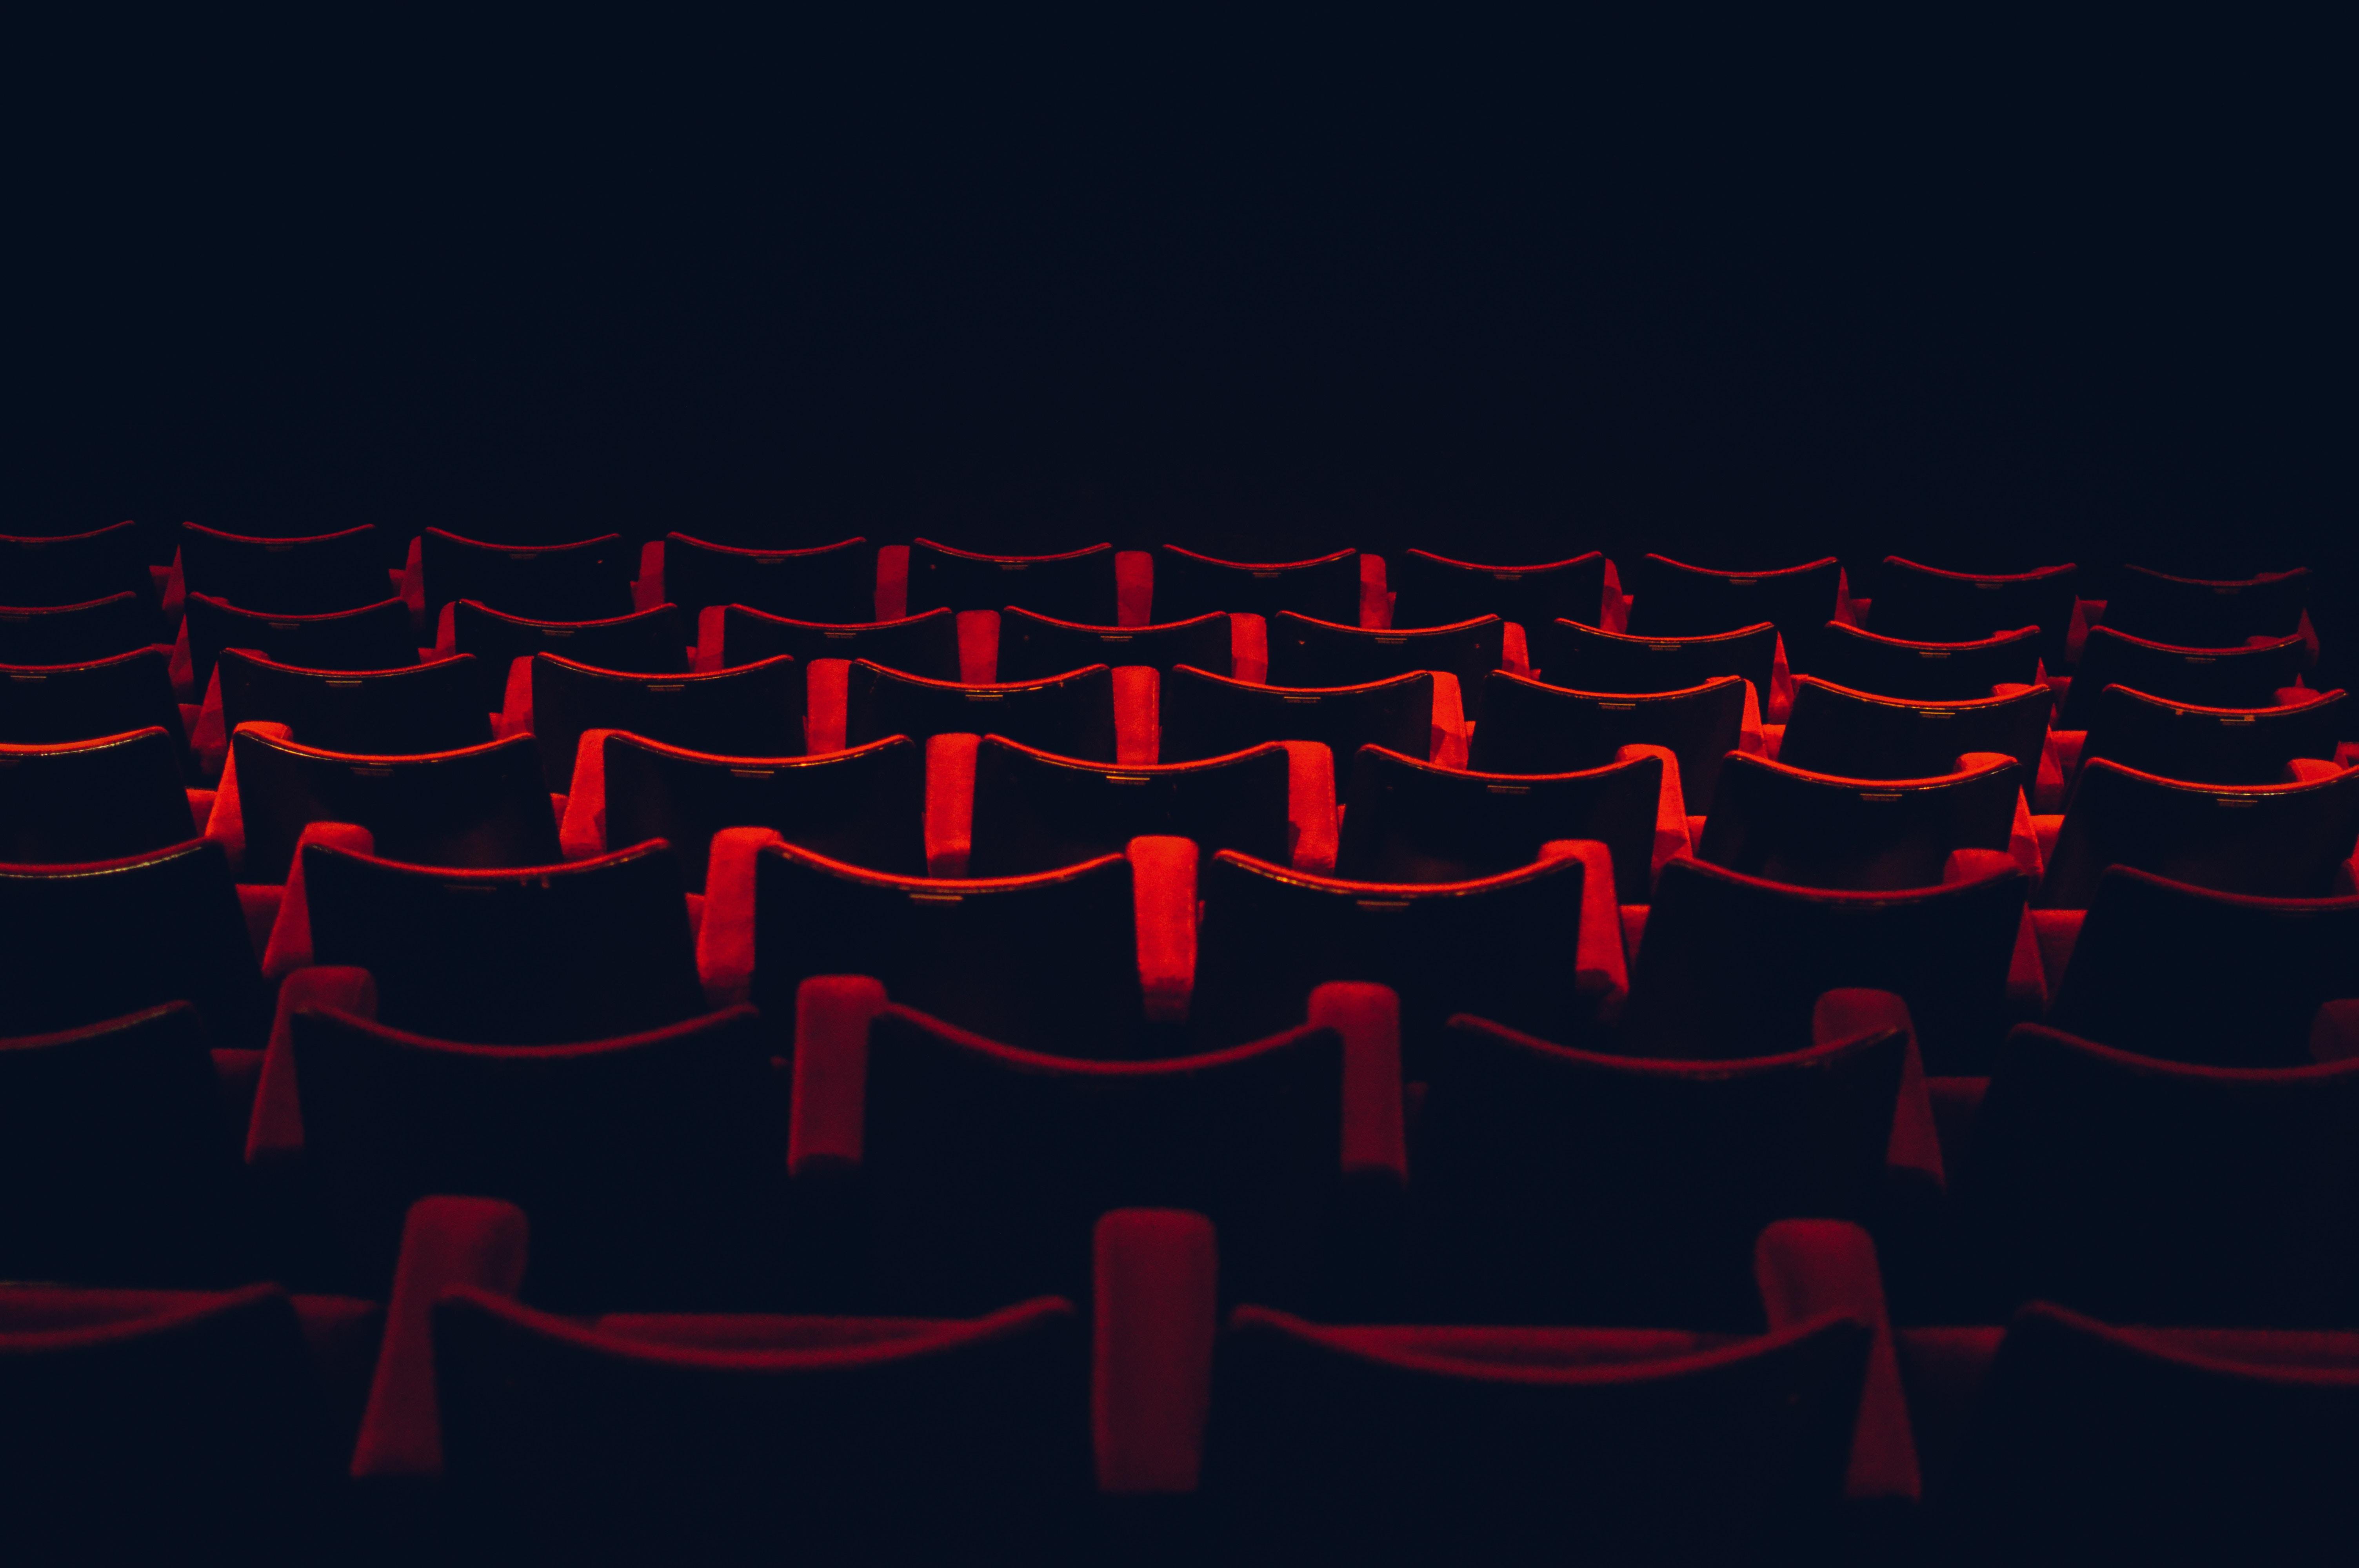 Red Cinema Seats - Photo by Lloyd Dirks on Unsplash